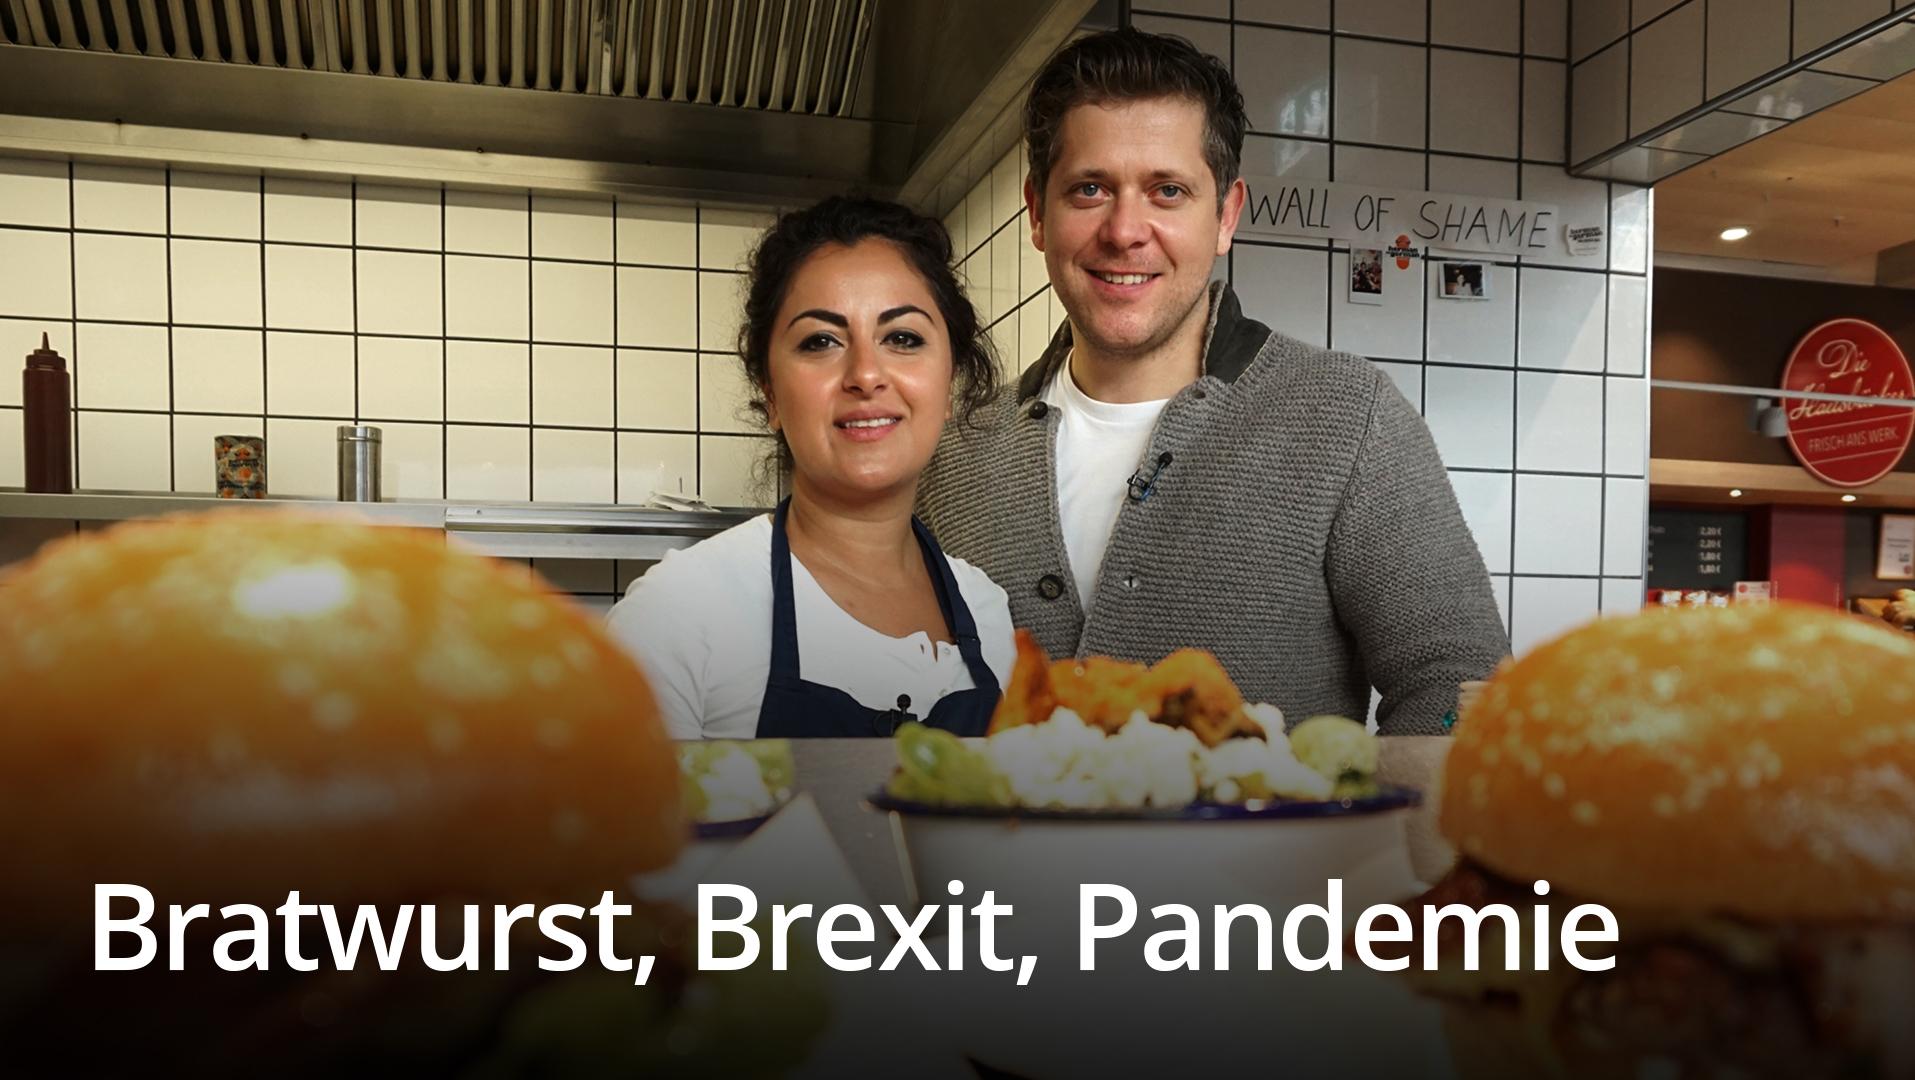 Bratwurst, Brexit, Pandemic